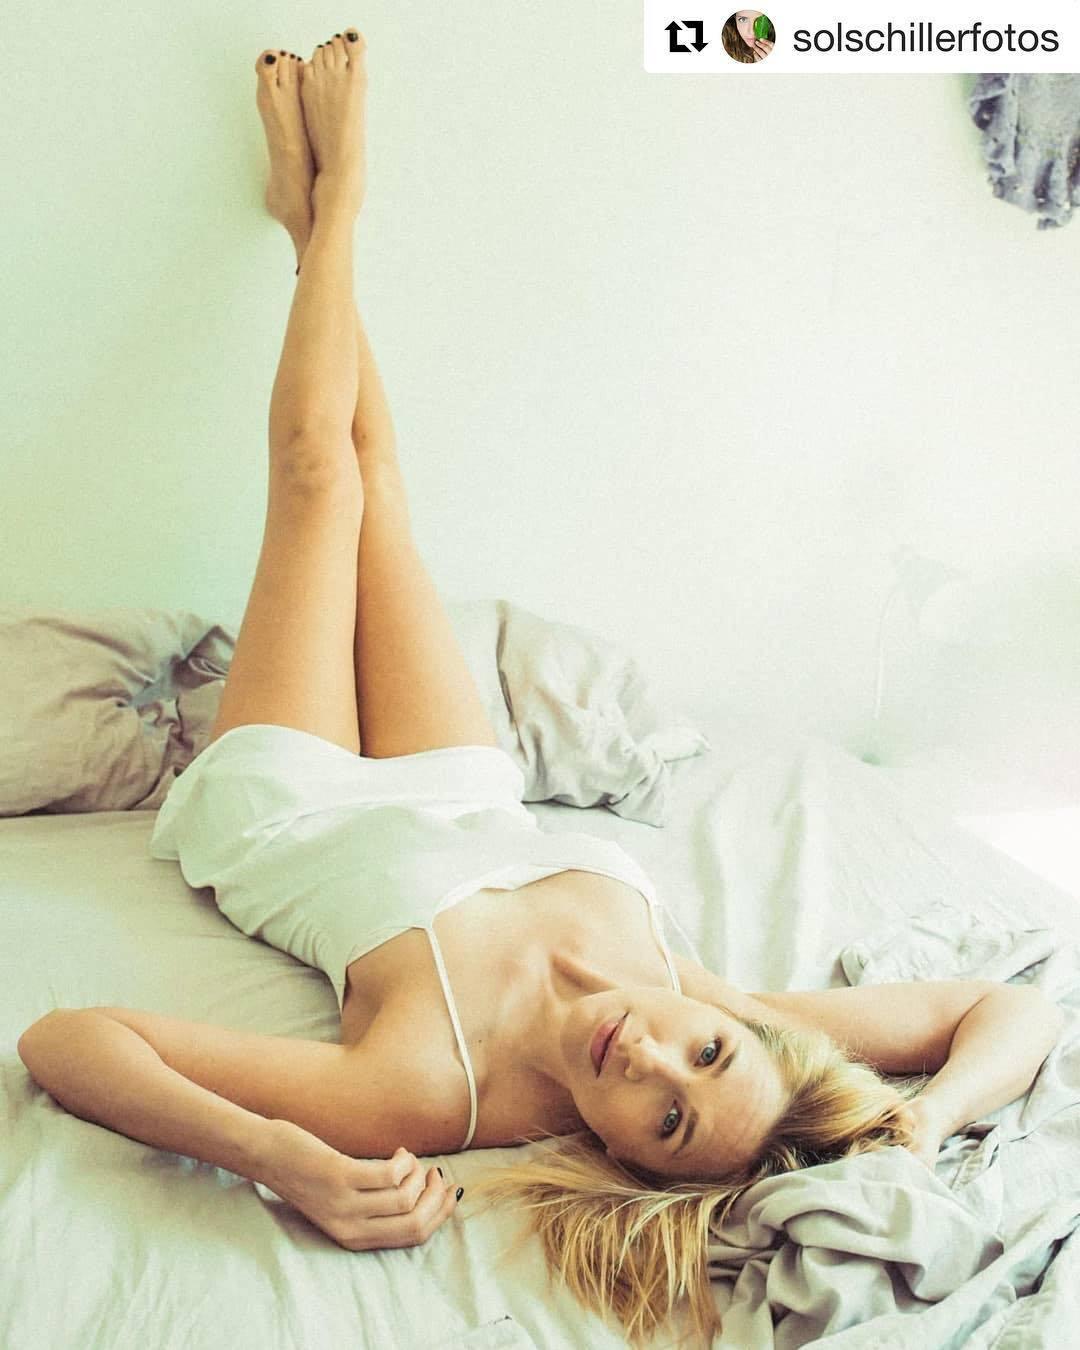 Alina-Moine-Feet-3782249.jpg